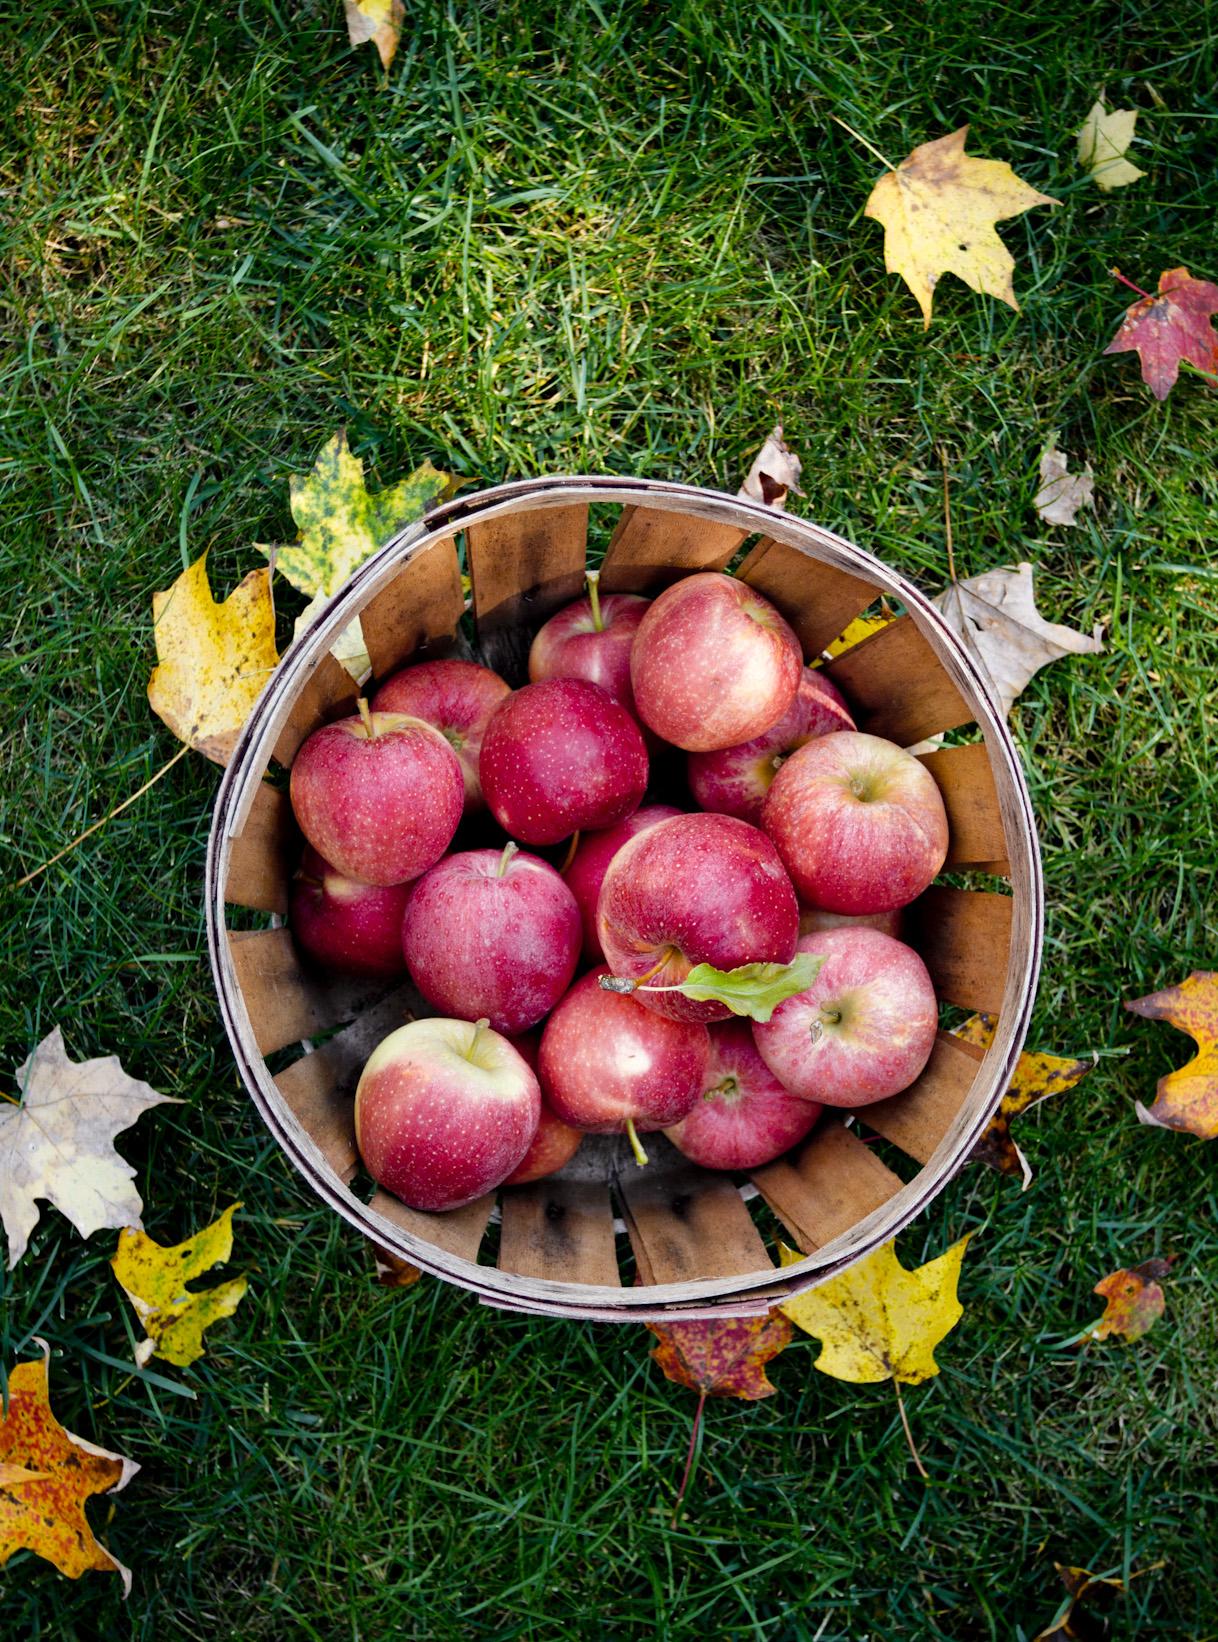 apple-picking-autumn-wood-basket-foliage.jpg